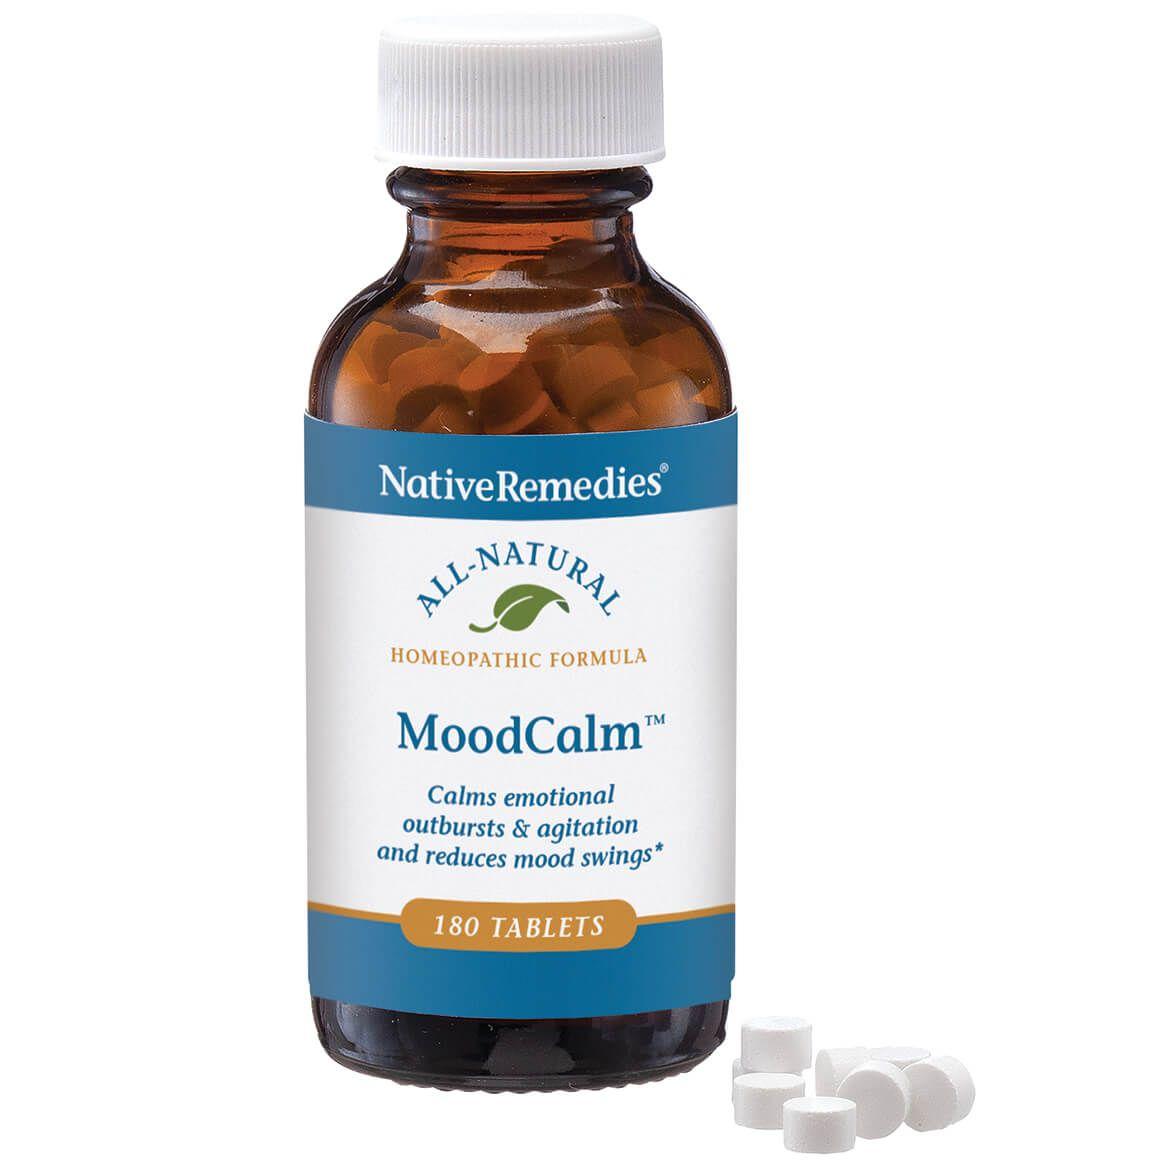 NativeRemedies® MoodCalm™-351844